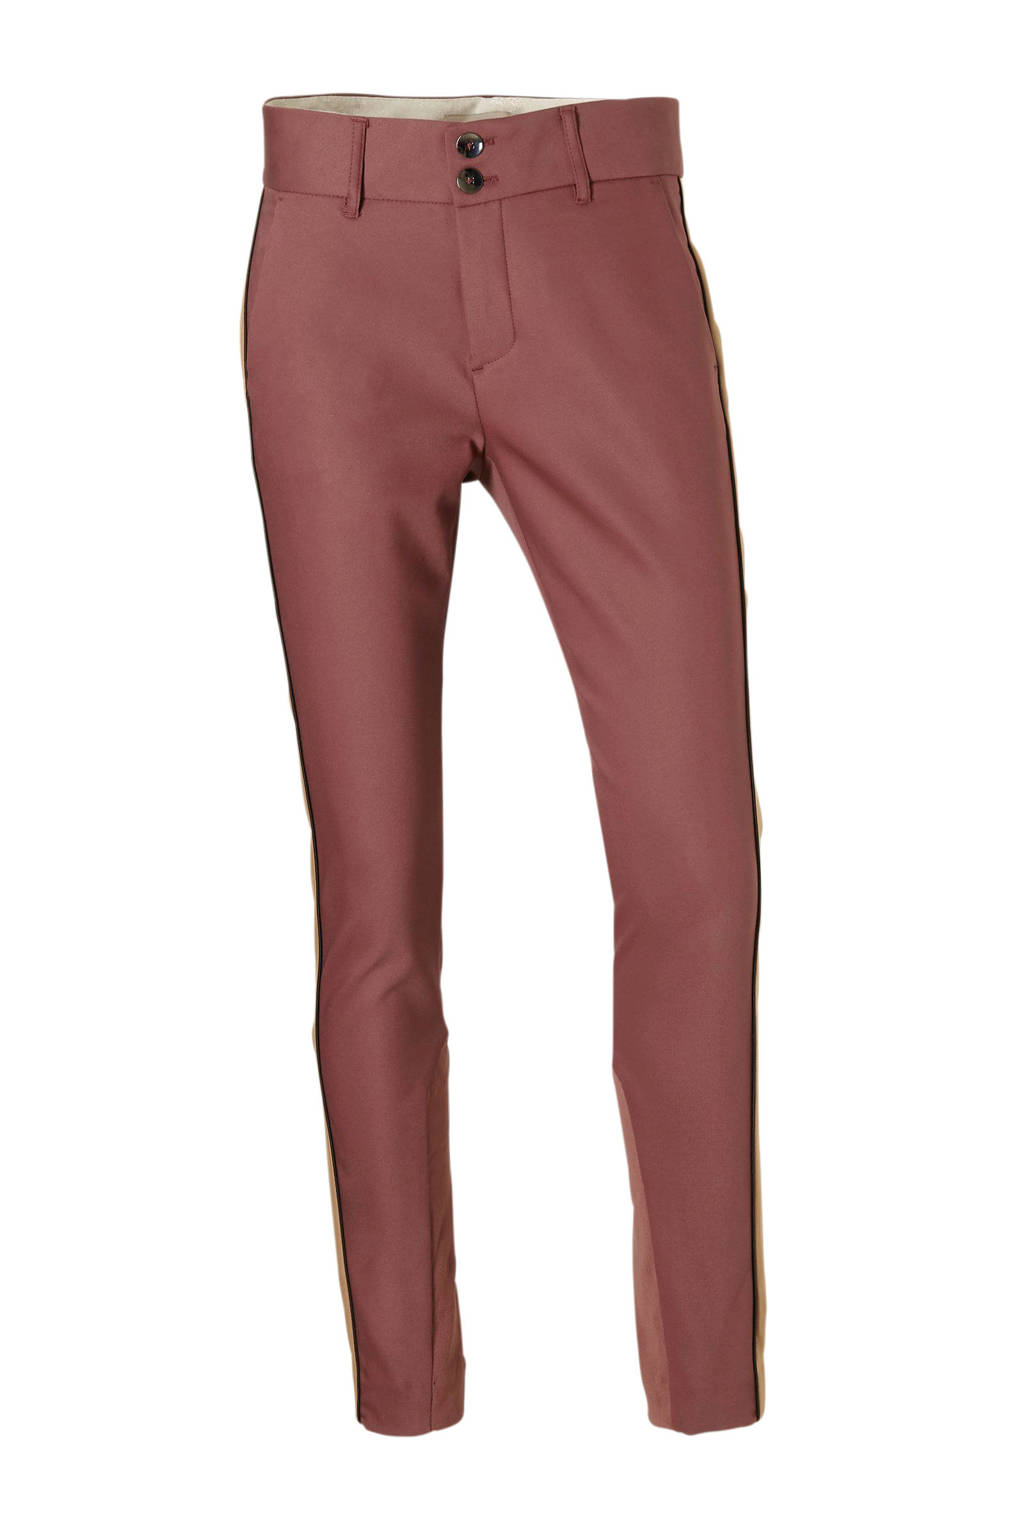 Mos Mosh gestreepte high waist regular fit broek rood, Rood